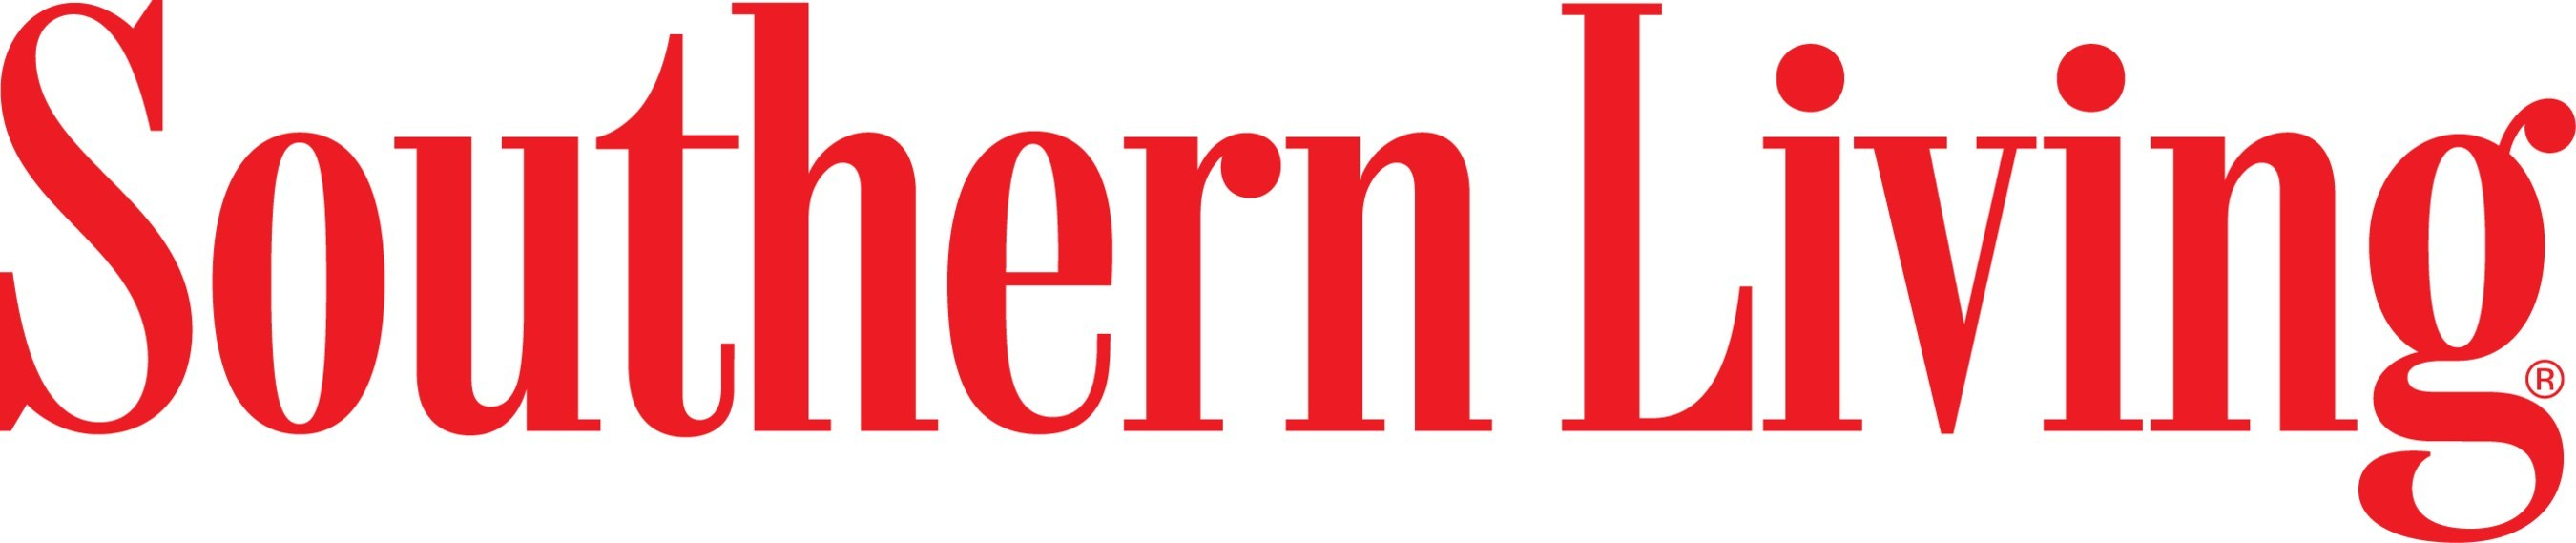 Southern Living Names 10 Tastemakers   Jul 10, 10